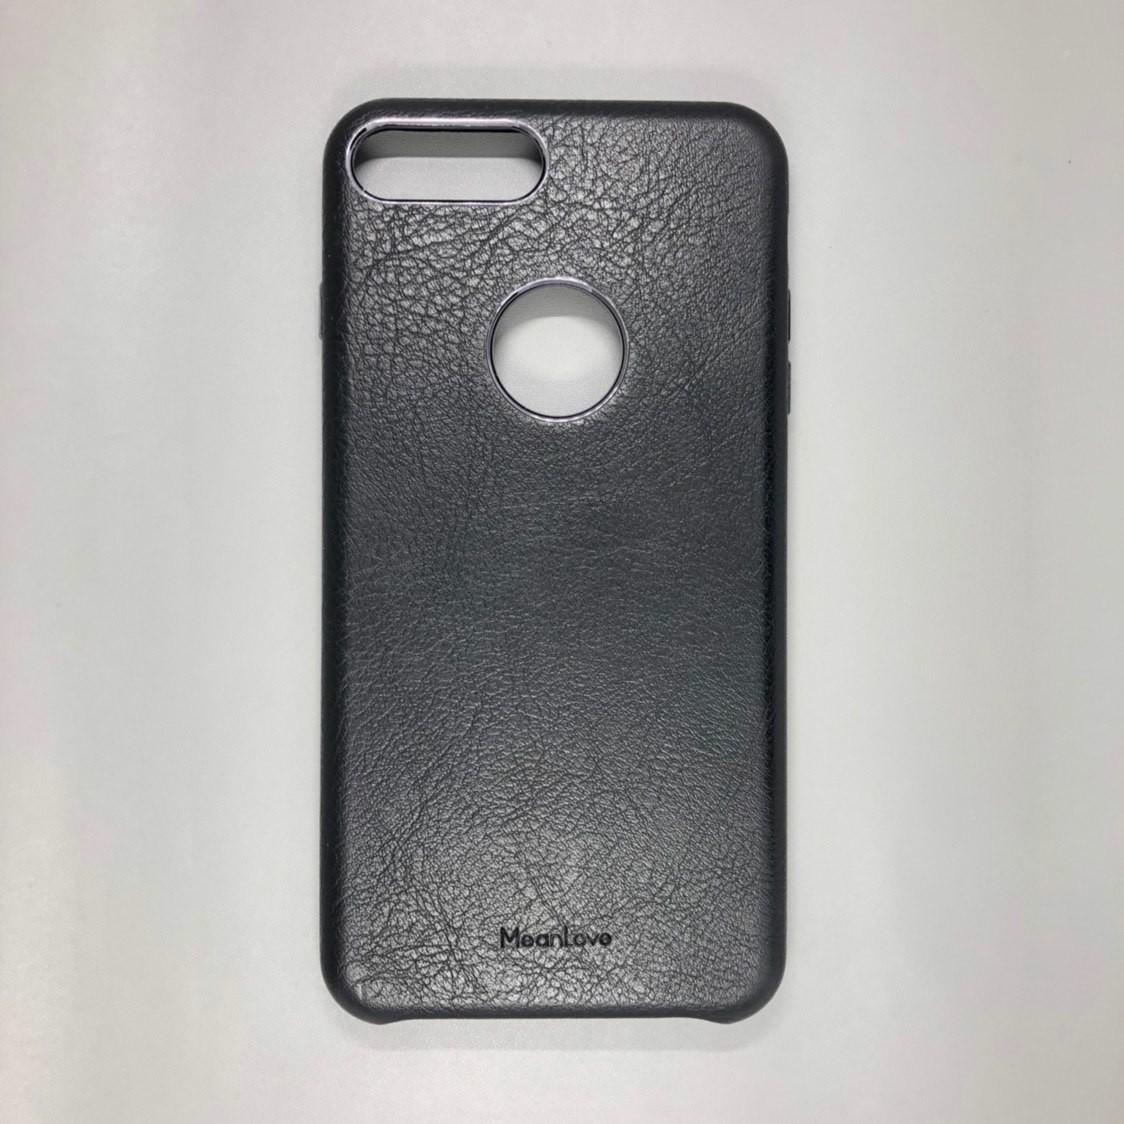 iPhone 7 Plus / 8 Plus MeanLove (кожа, черный)